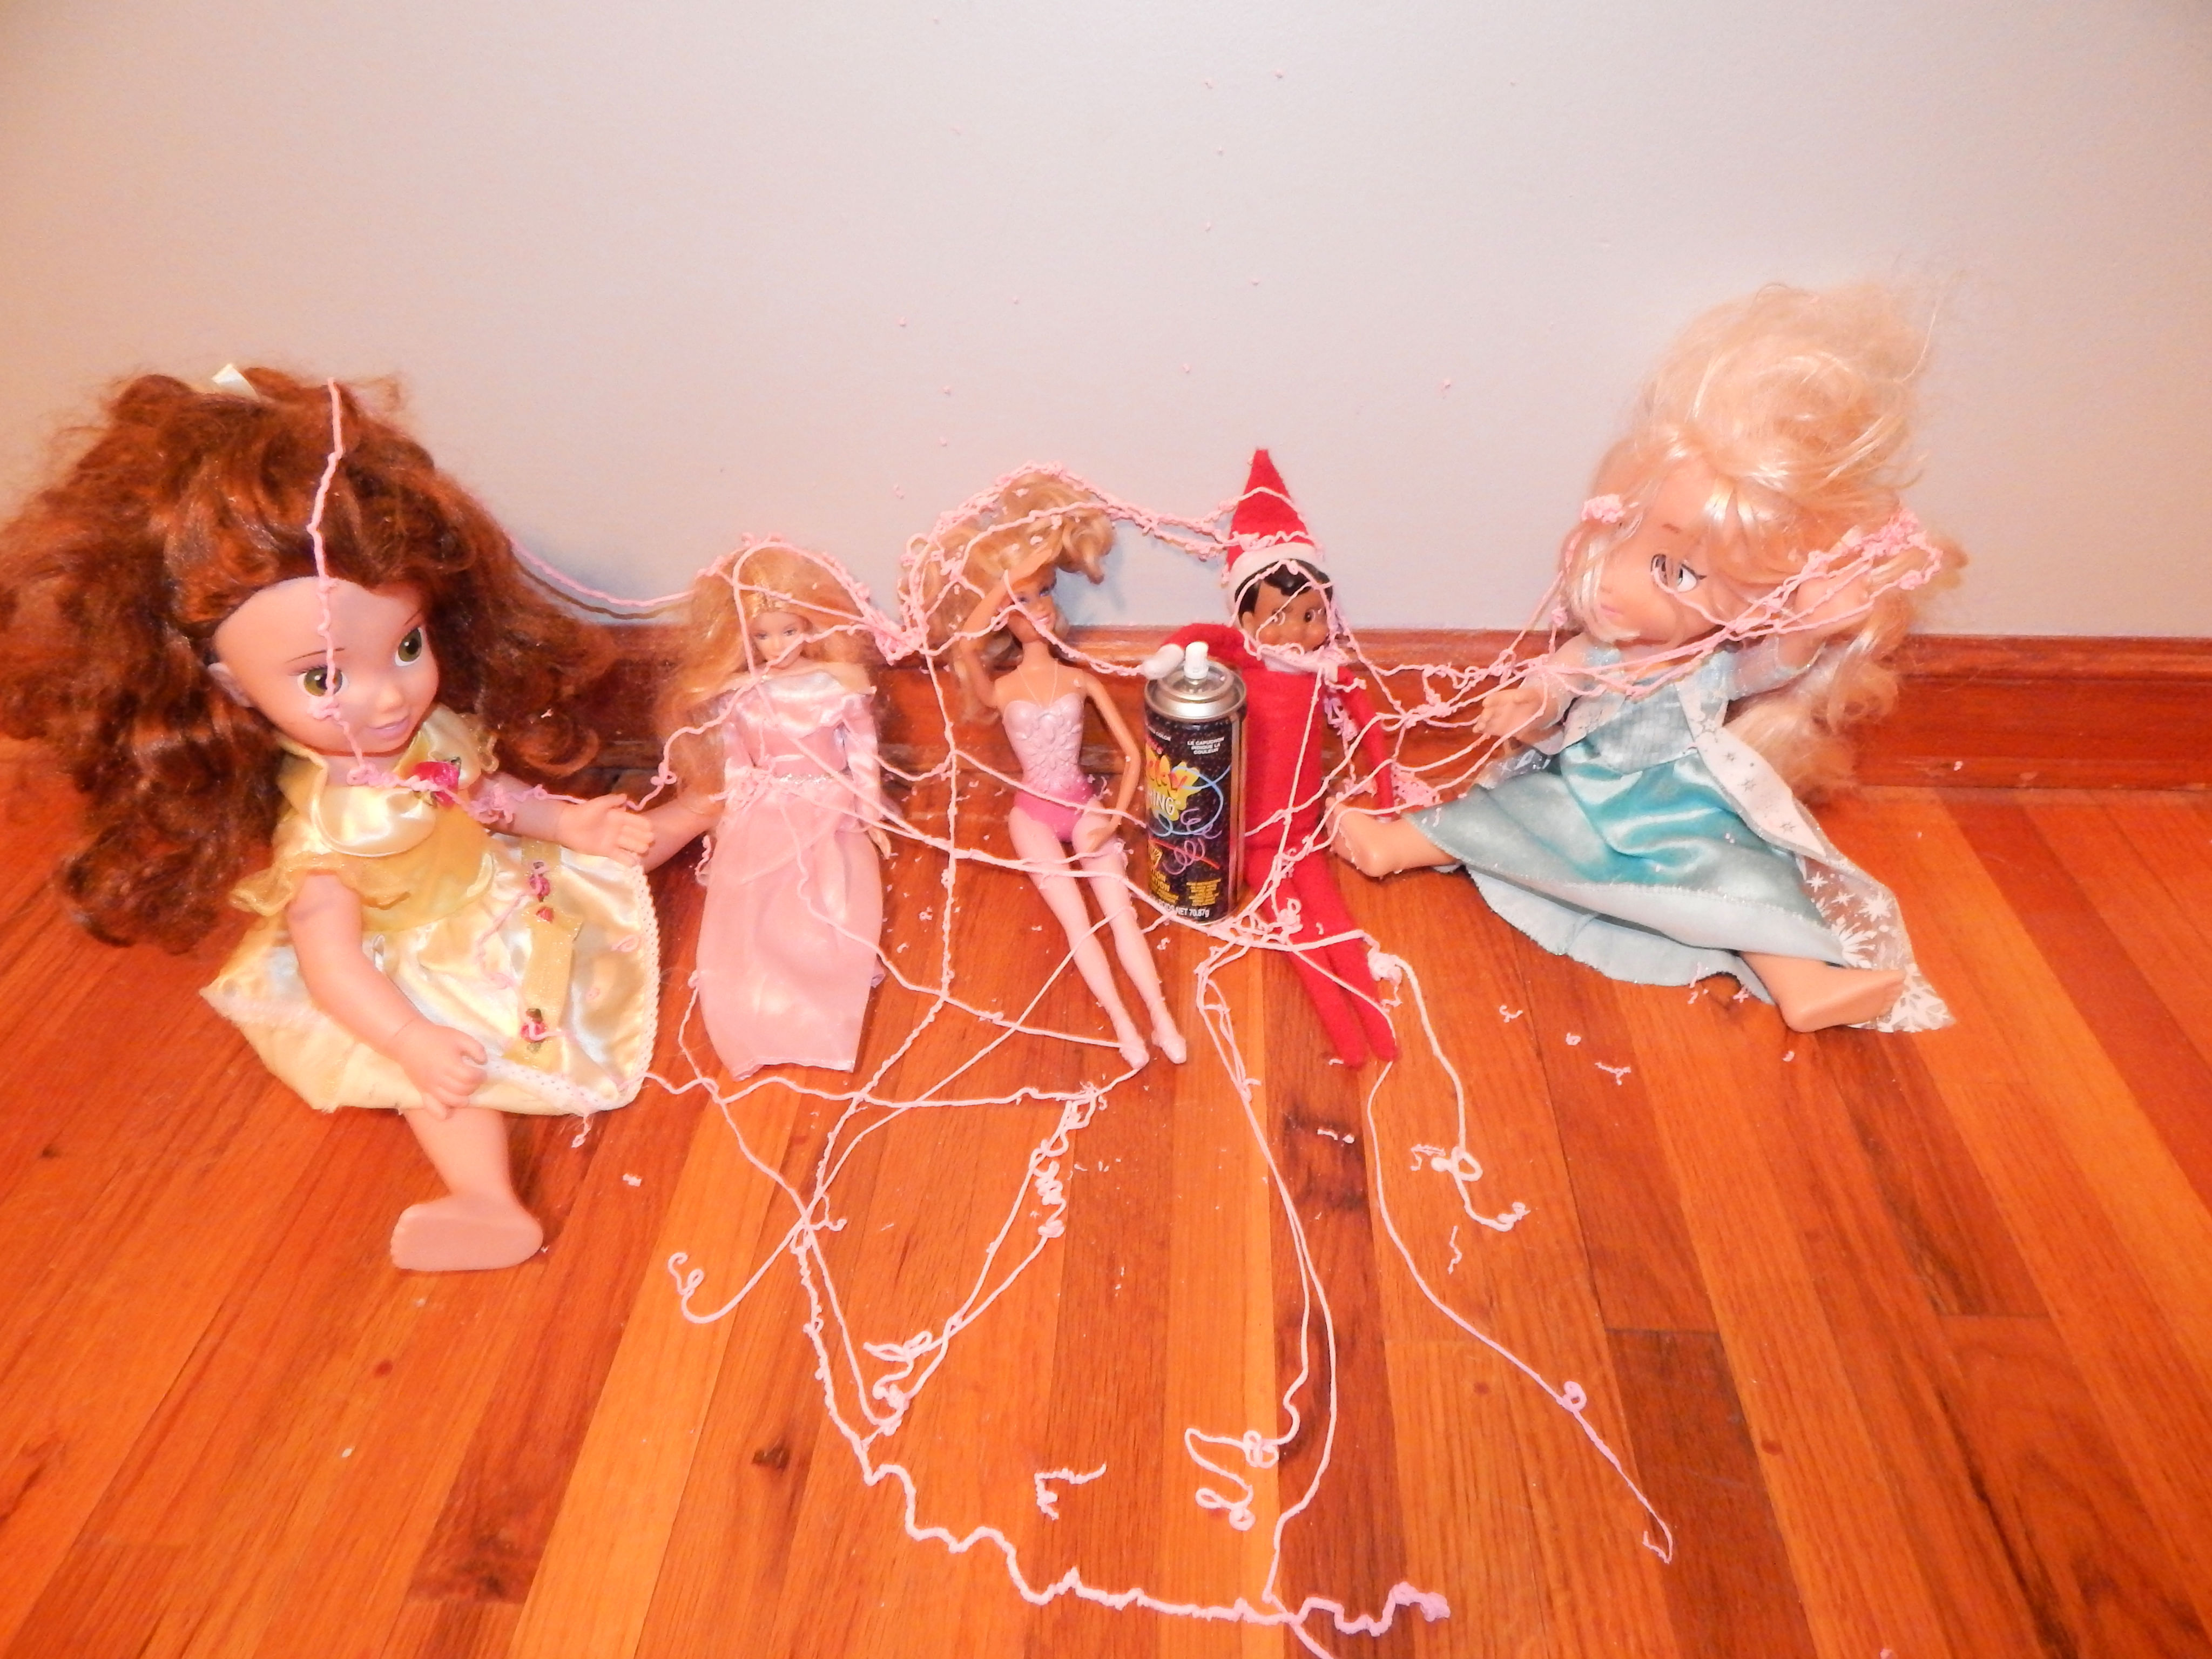 Naughty Little Elf On The Shelf